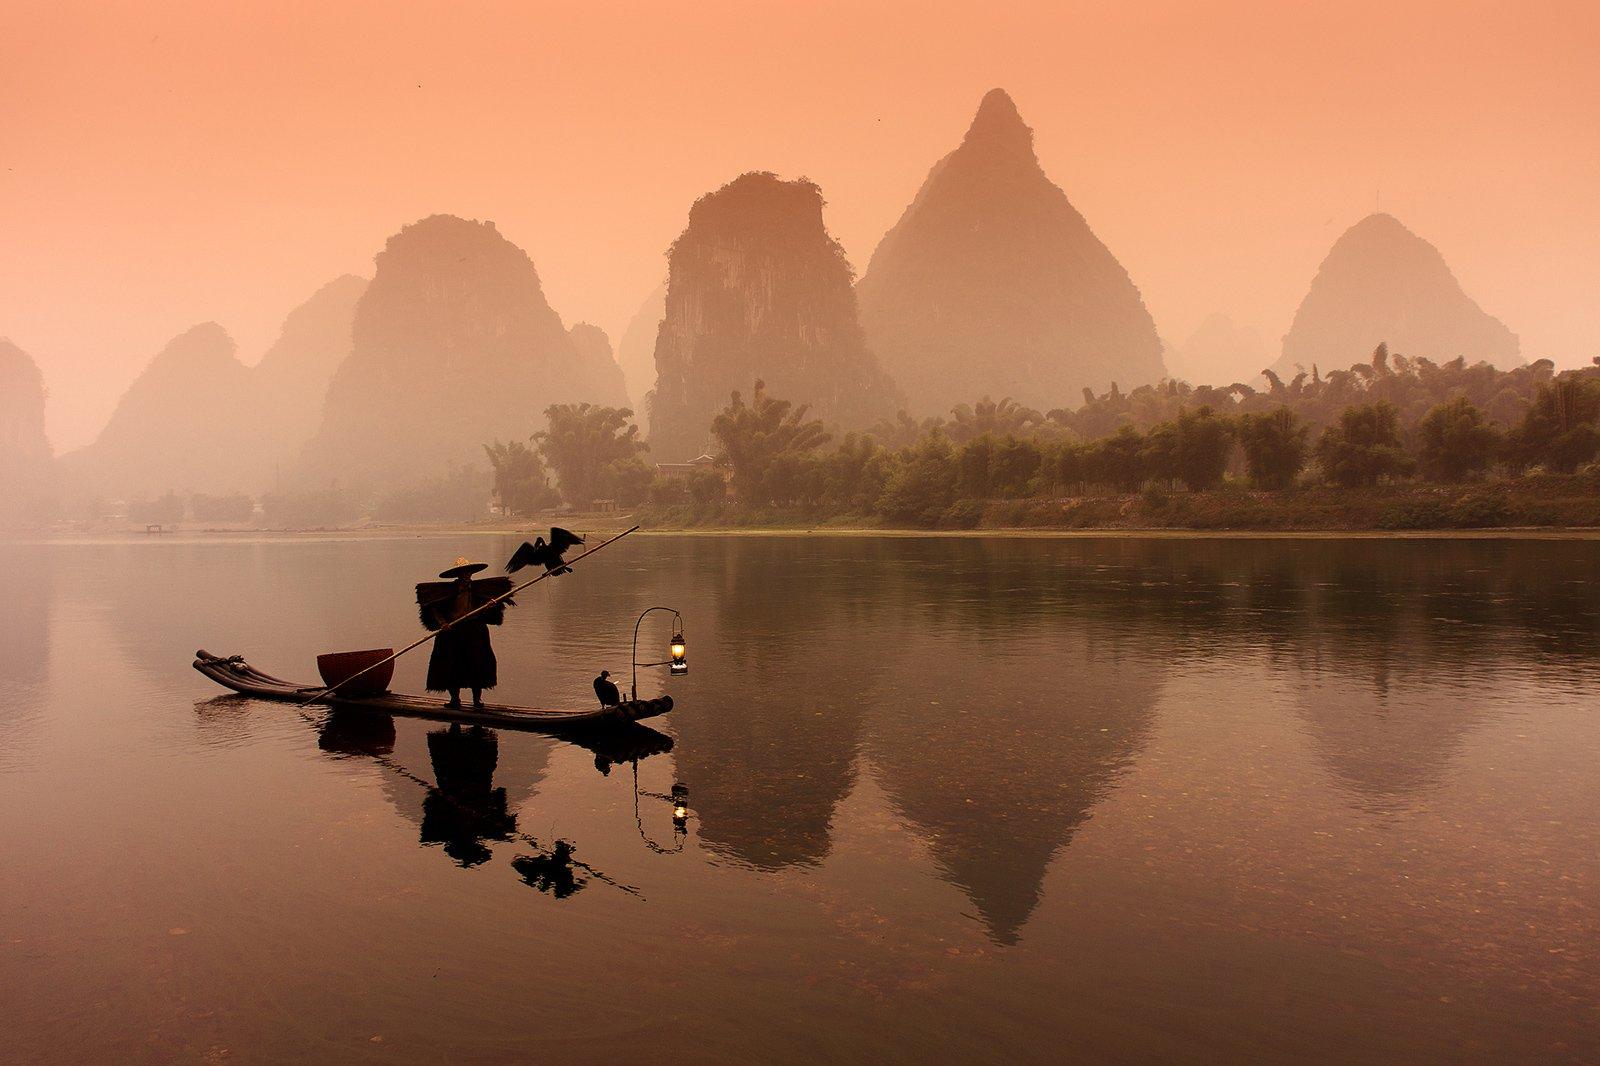 cormorant, fisherman, li, river, mountains, reflections, sunrise, Сергей Кузнецов